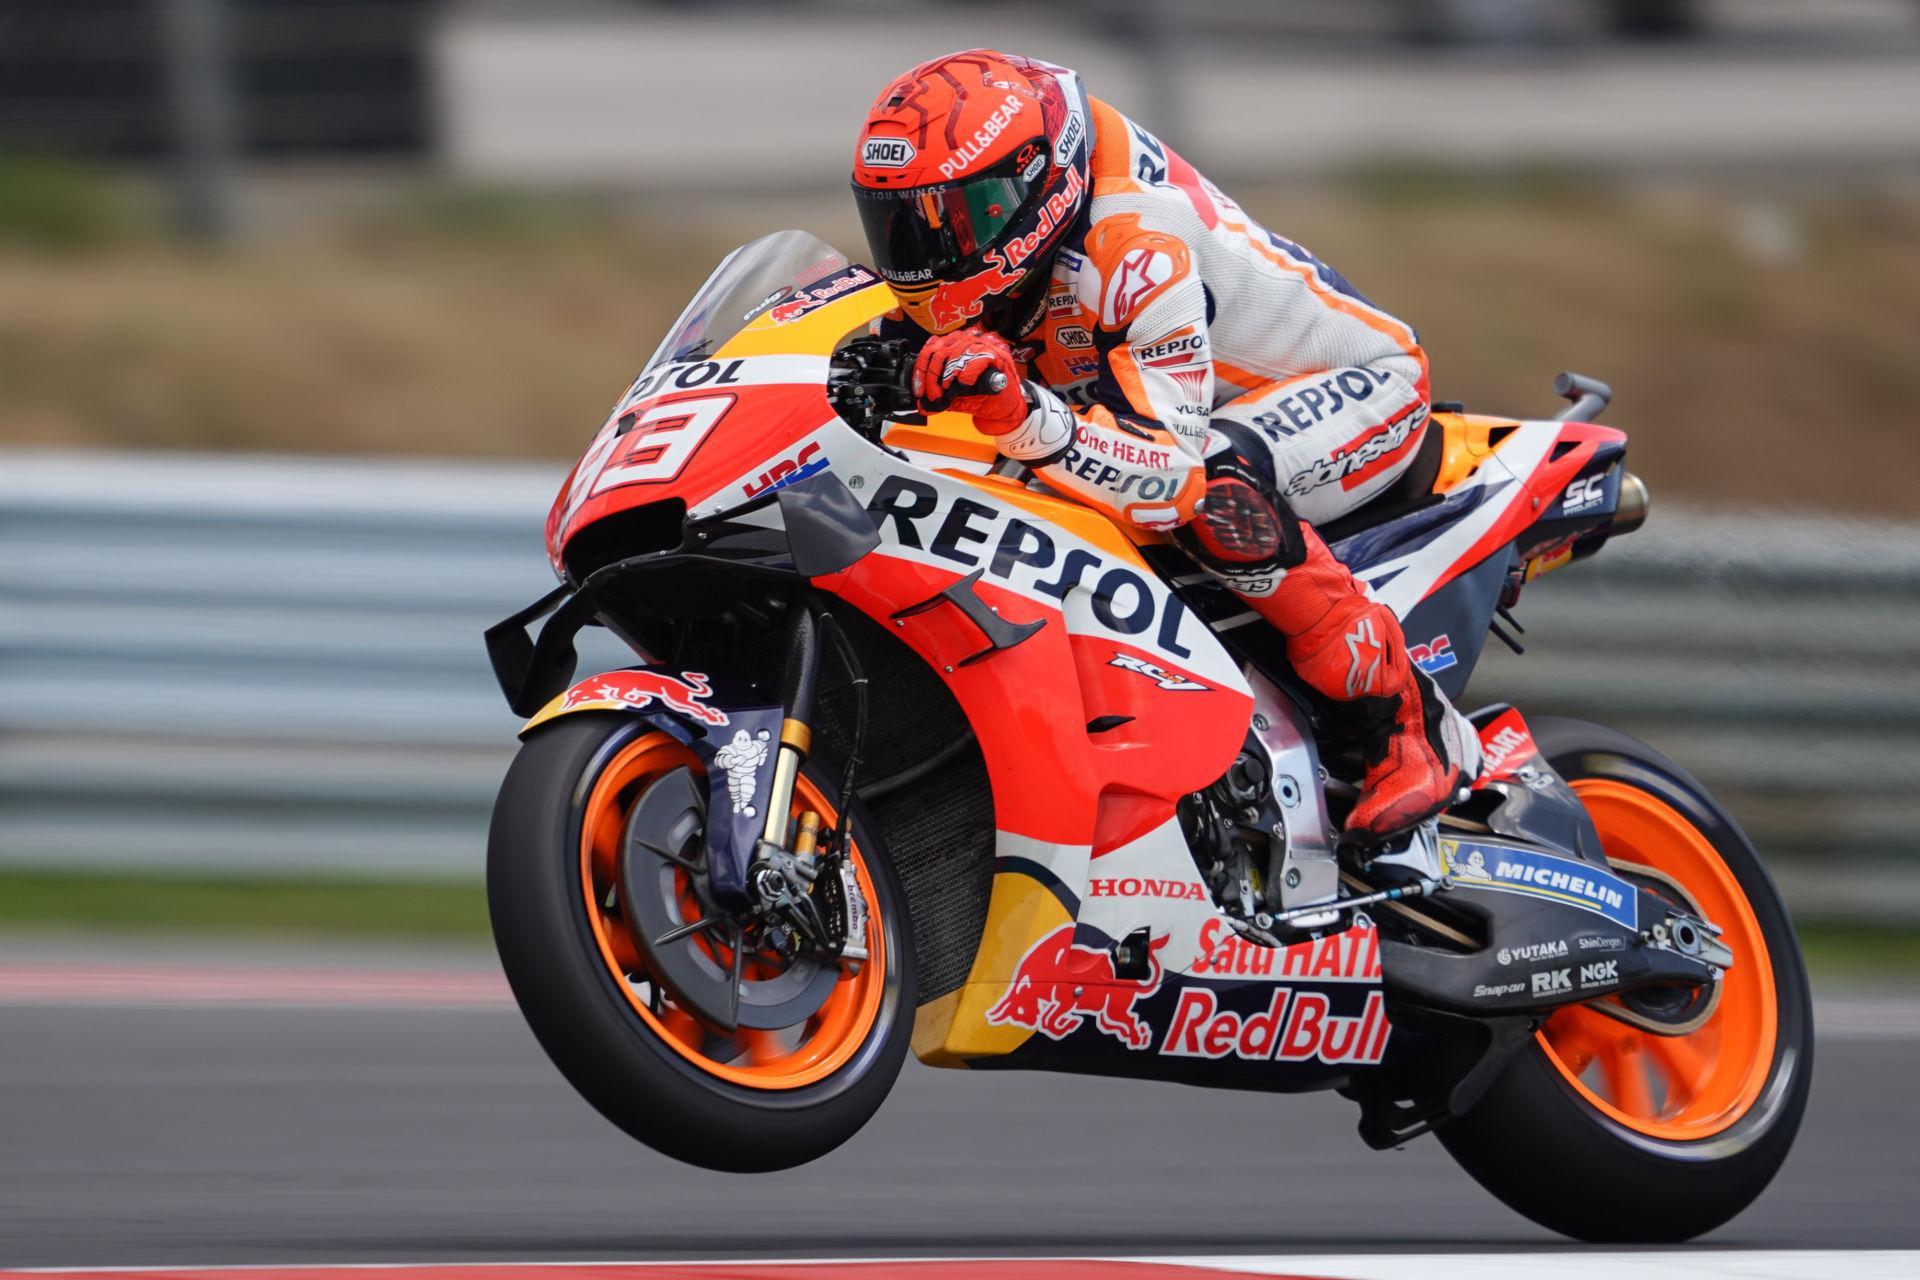 Marc Marquez (93) at speed in Portugal. Photo courtesy Repsol Honda.